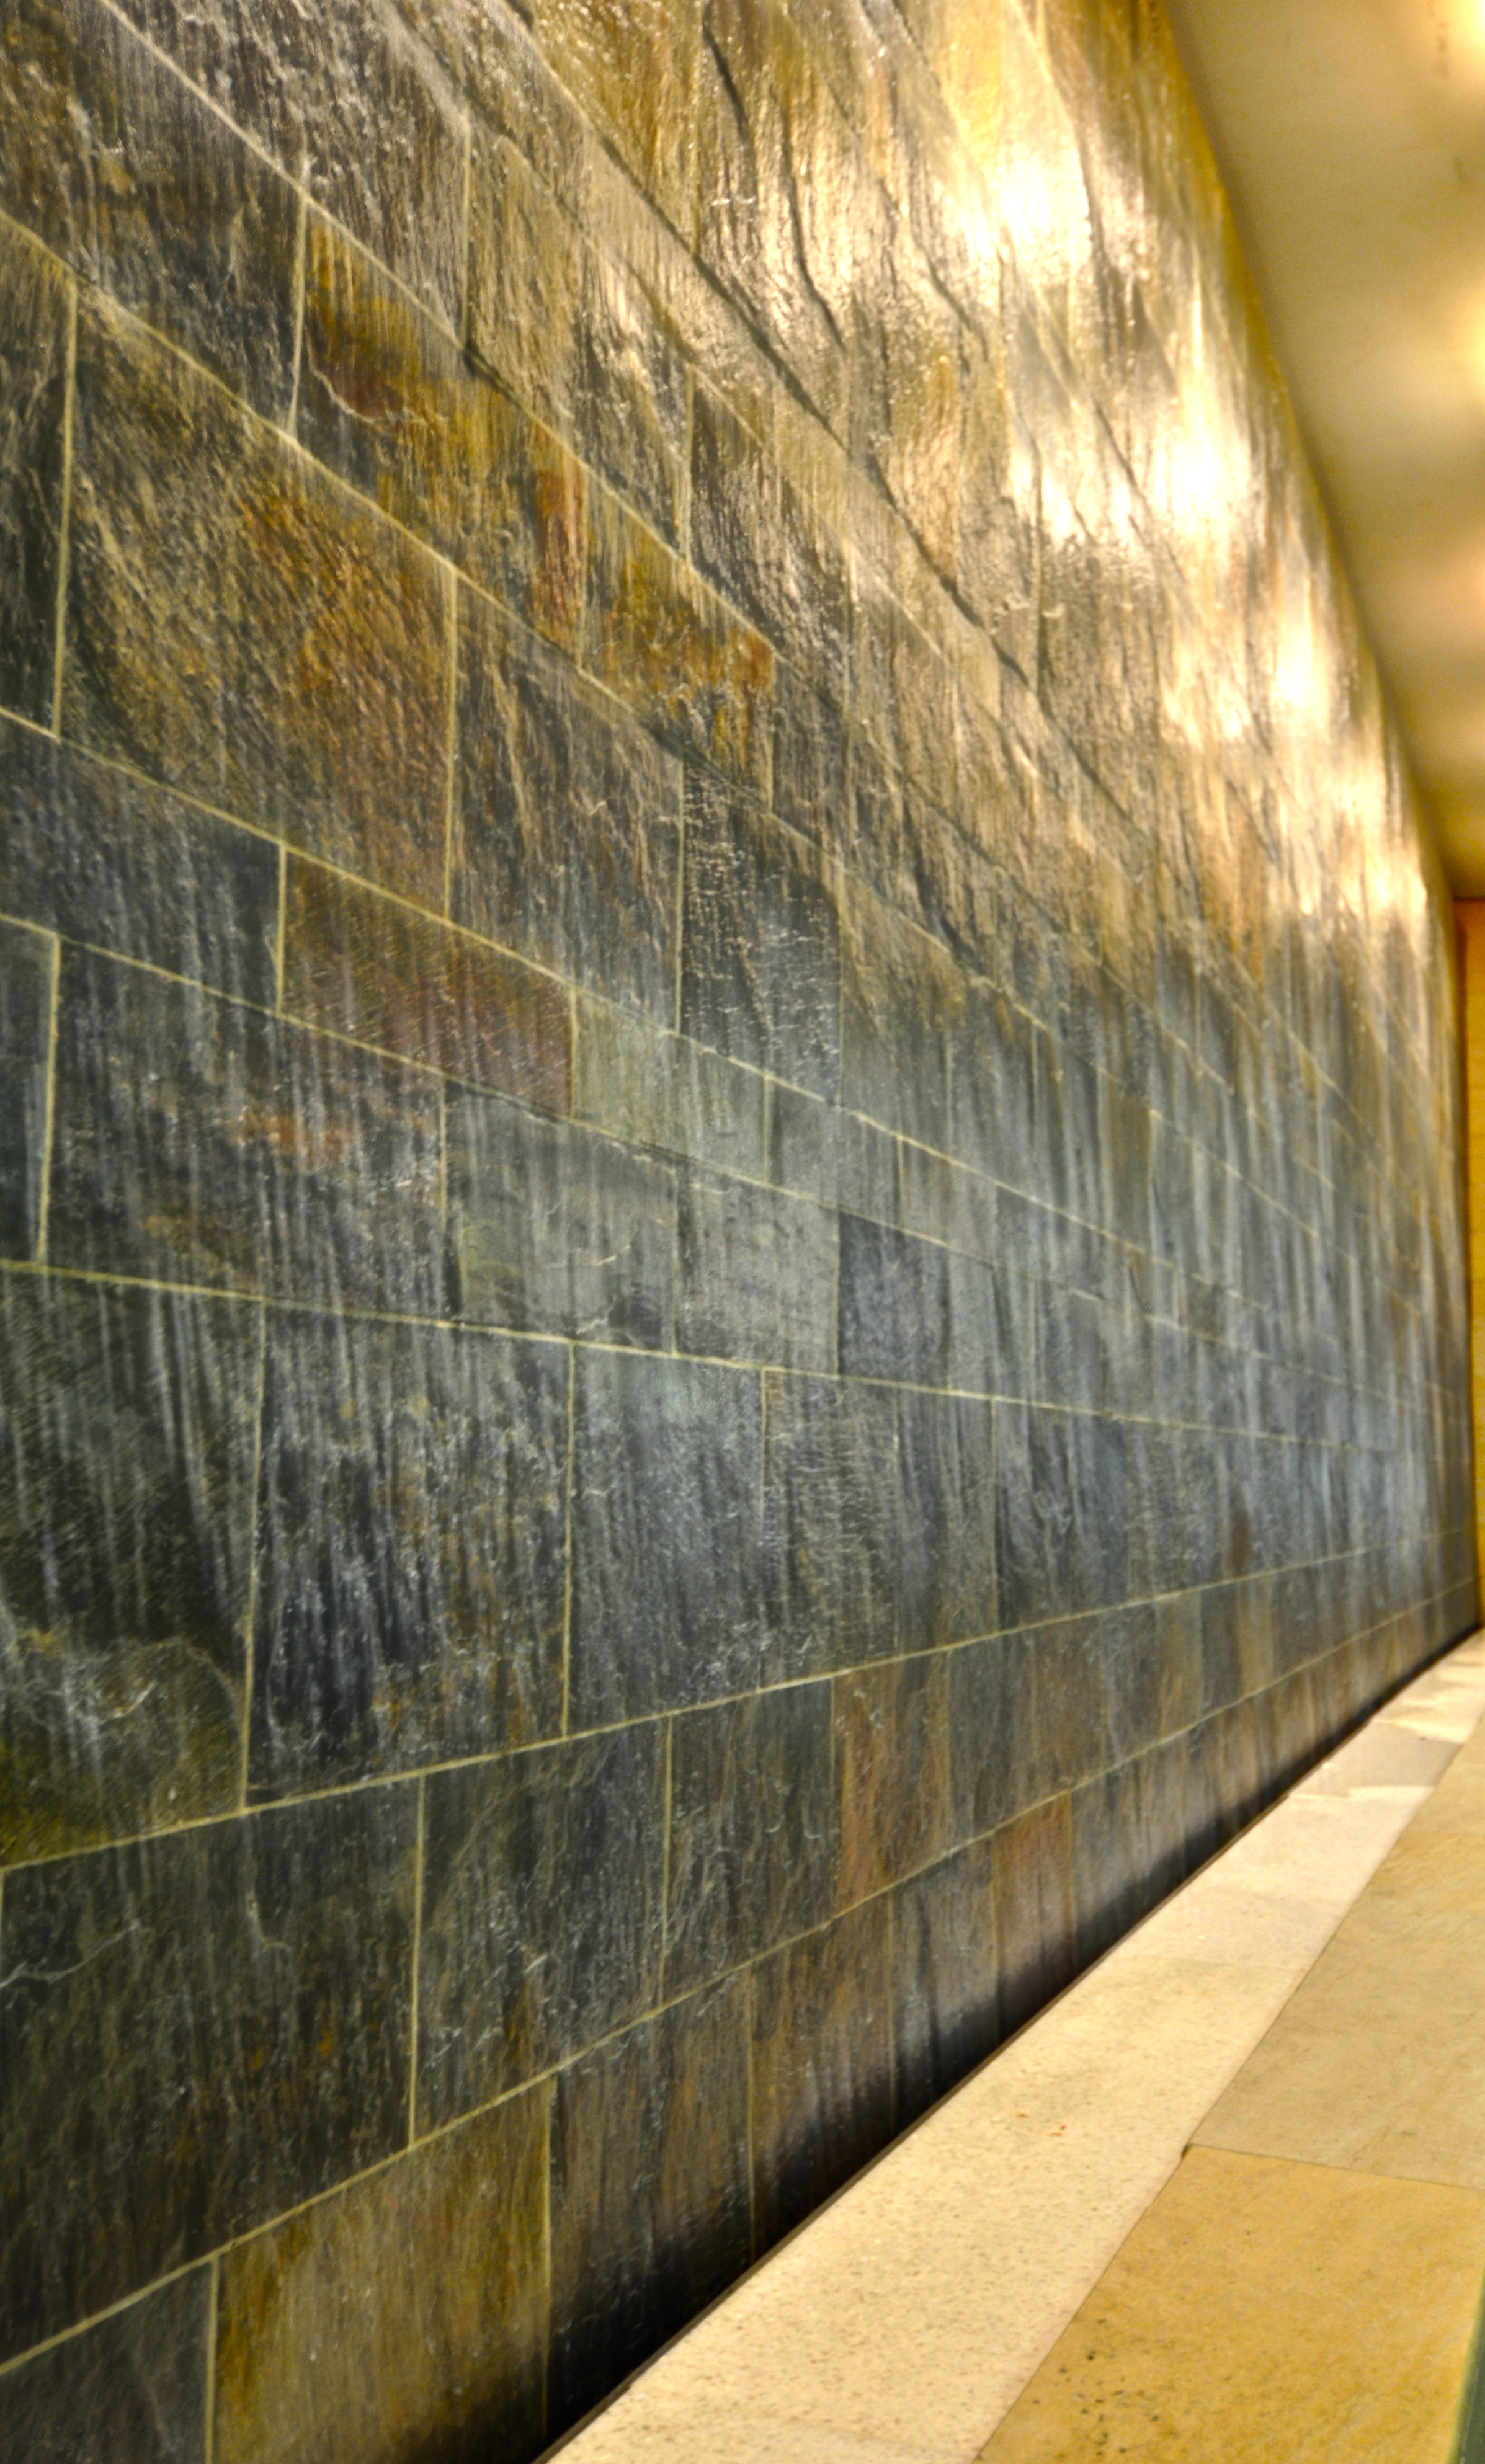 Granite water wall, Nashville International Airport, Detail, Nashville, TN.